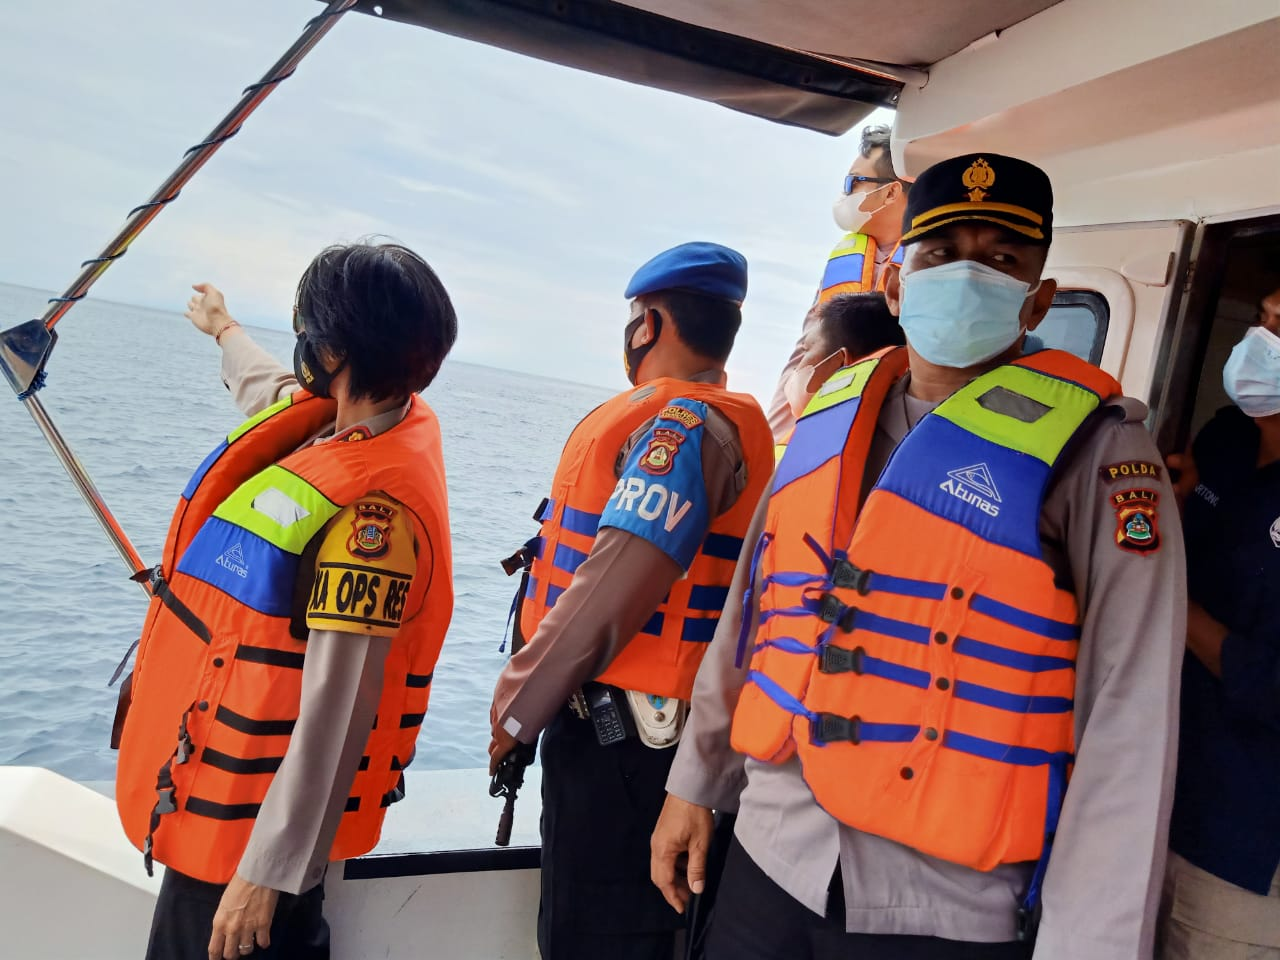 Kapolres Karangasem AKBP Suartini Pimpin Patroli Antisipasi Radikalis Jalur Laut